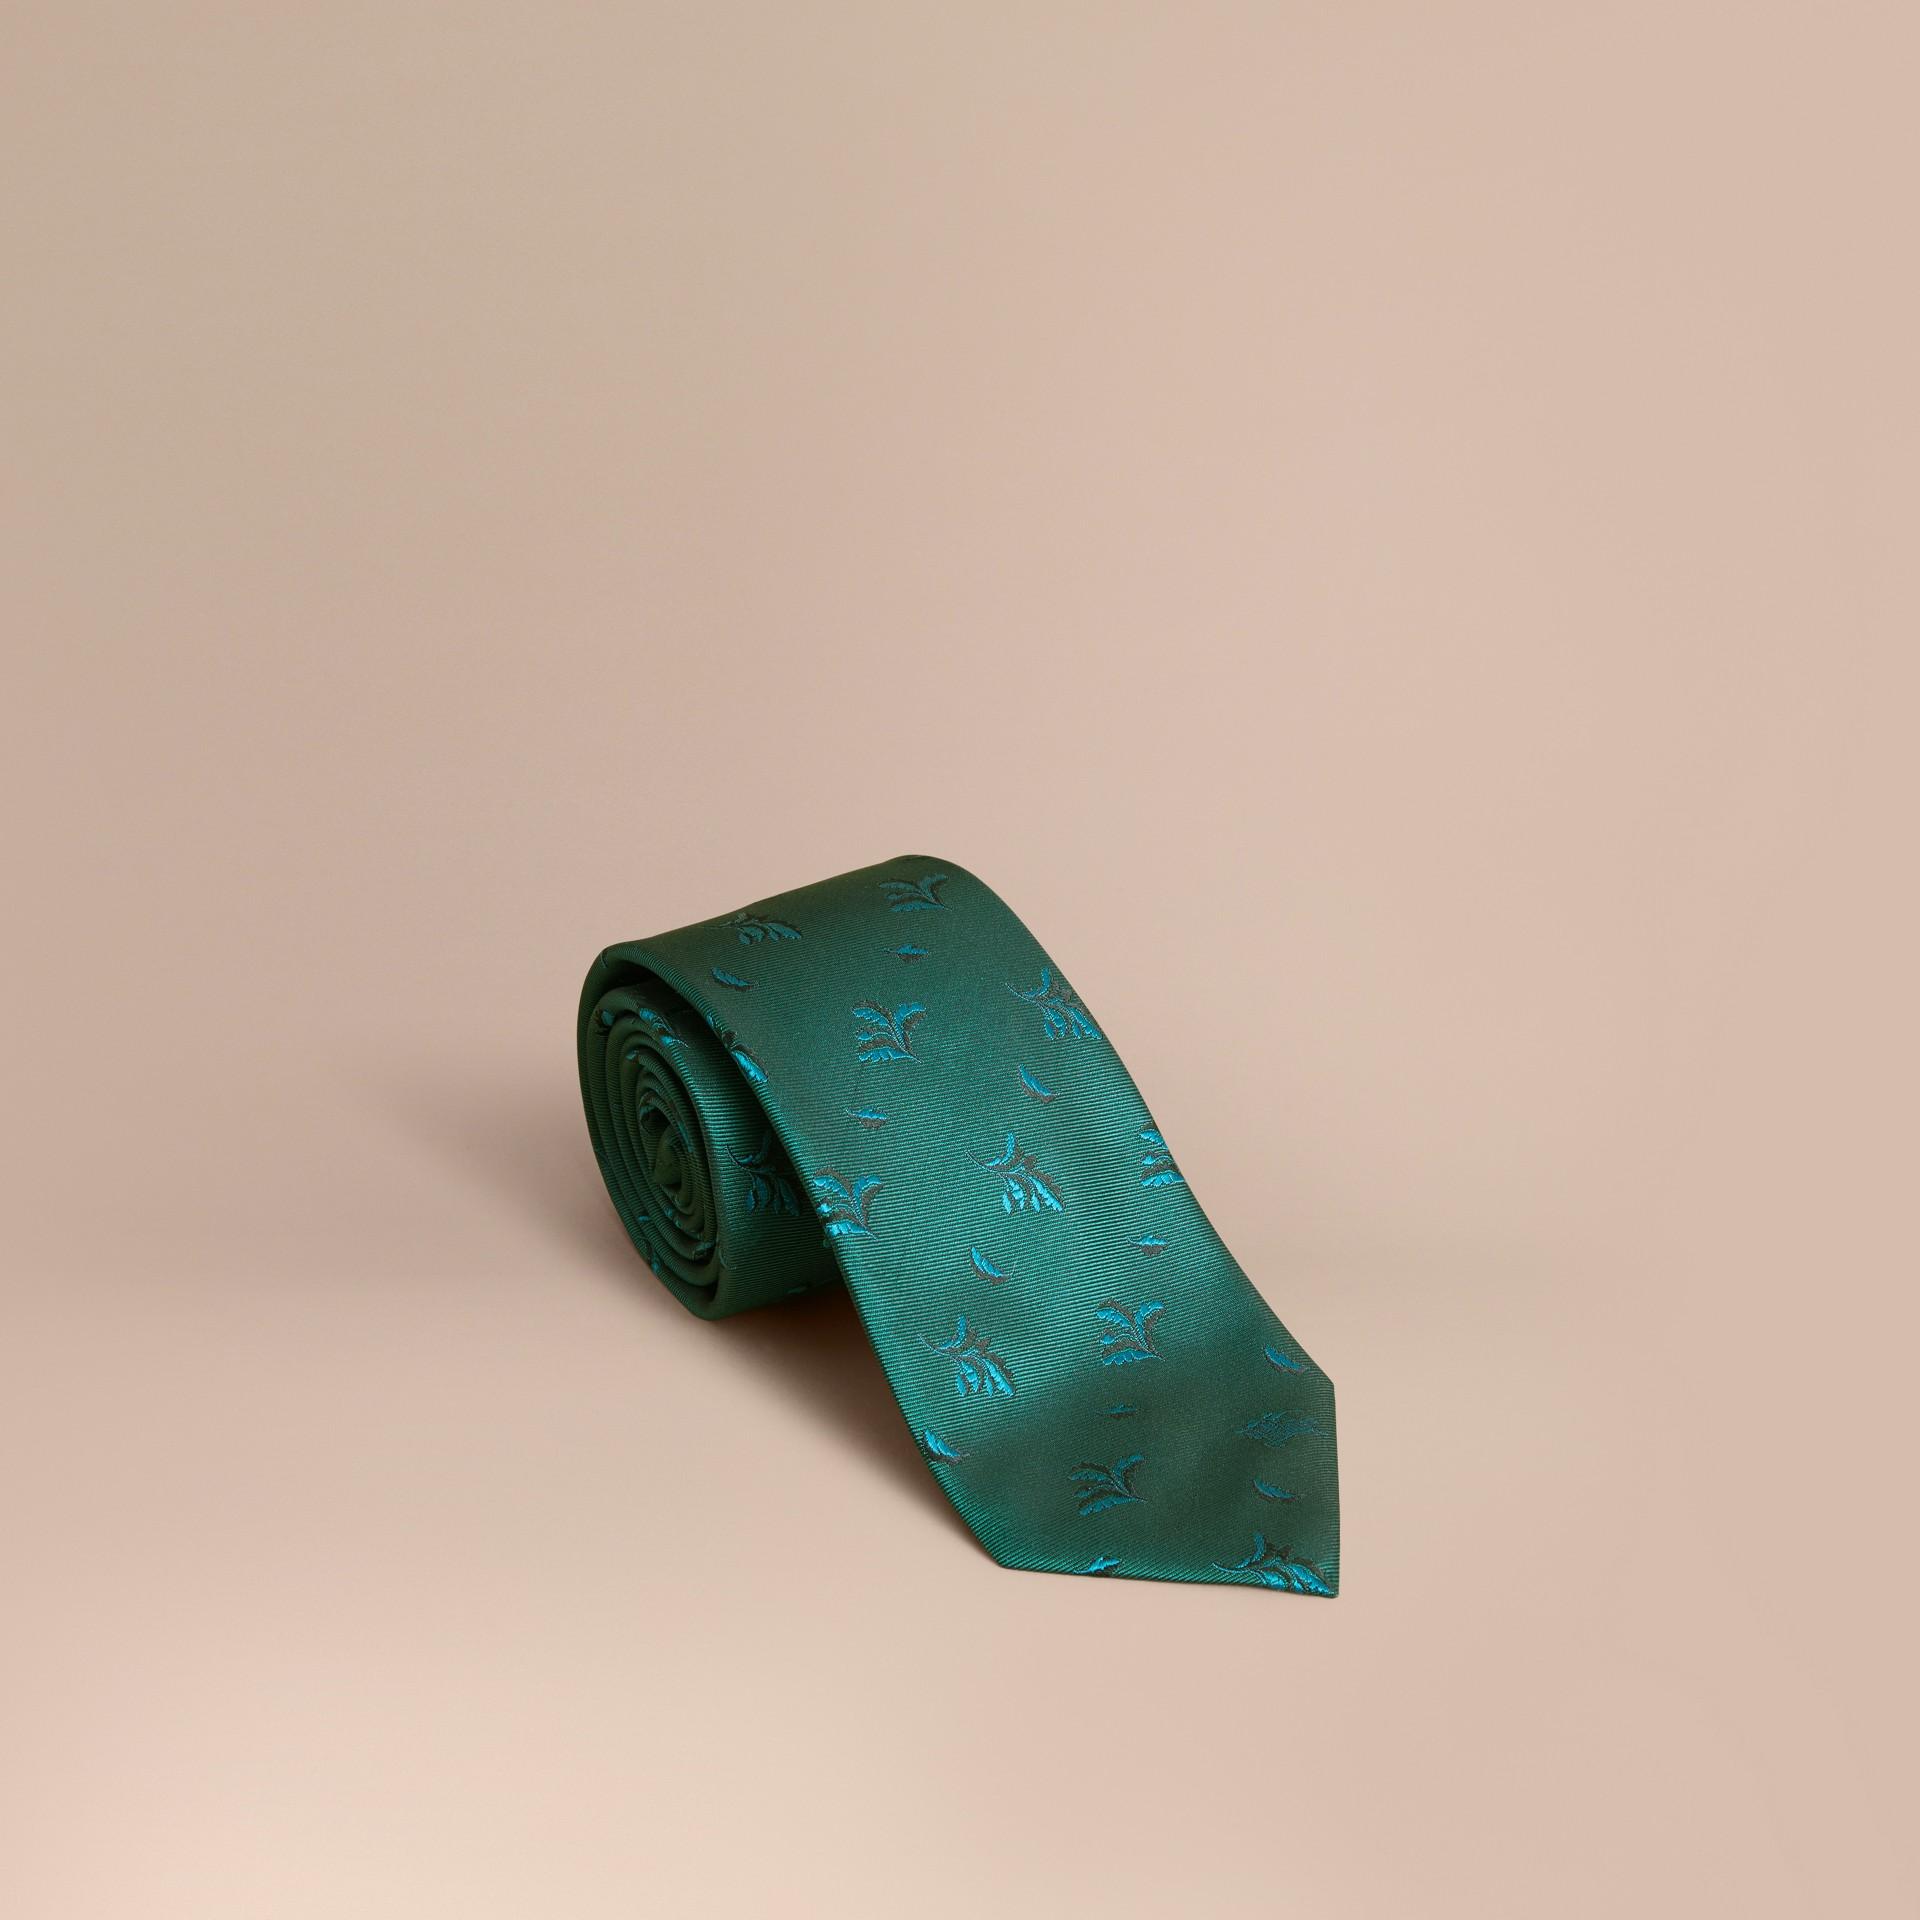 Modern geschnittene Seidenkrawatte in Jacquard-Webung mit Blattmuster Blaugrün - Galerie-Bild 1